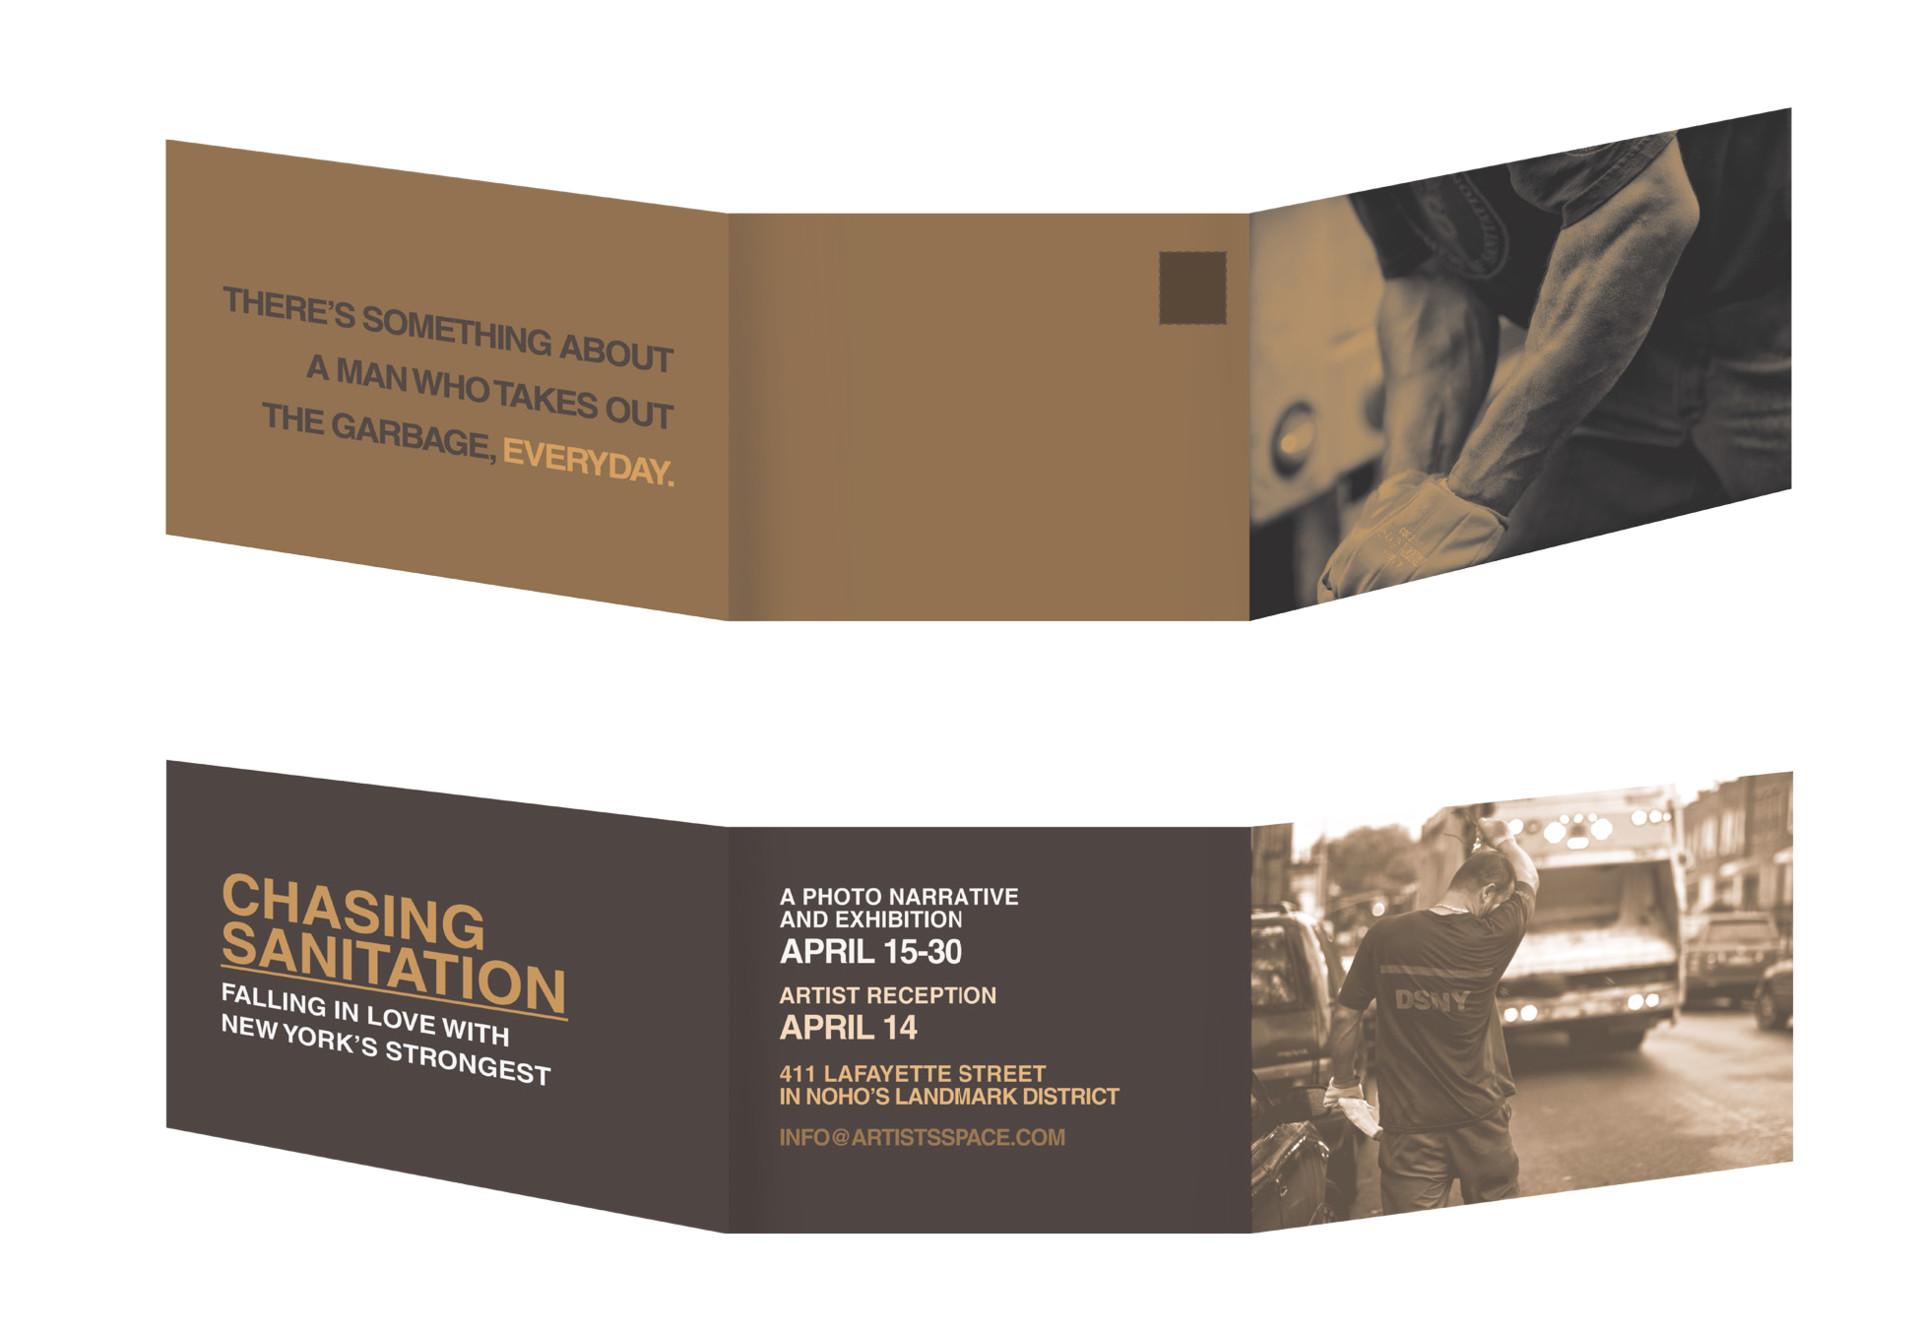 shivana brhamadat trifold mailer invitation